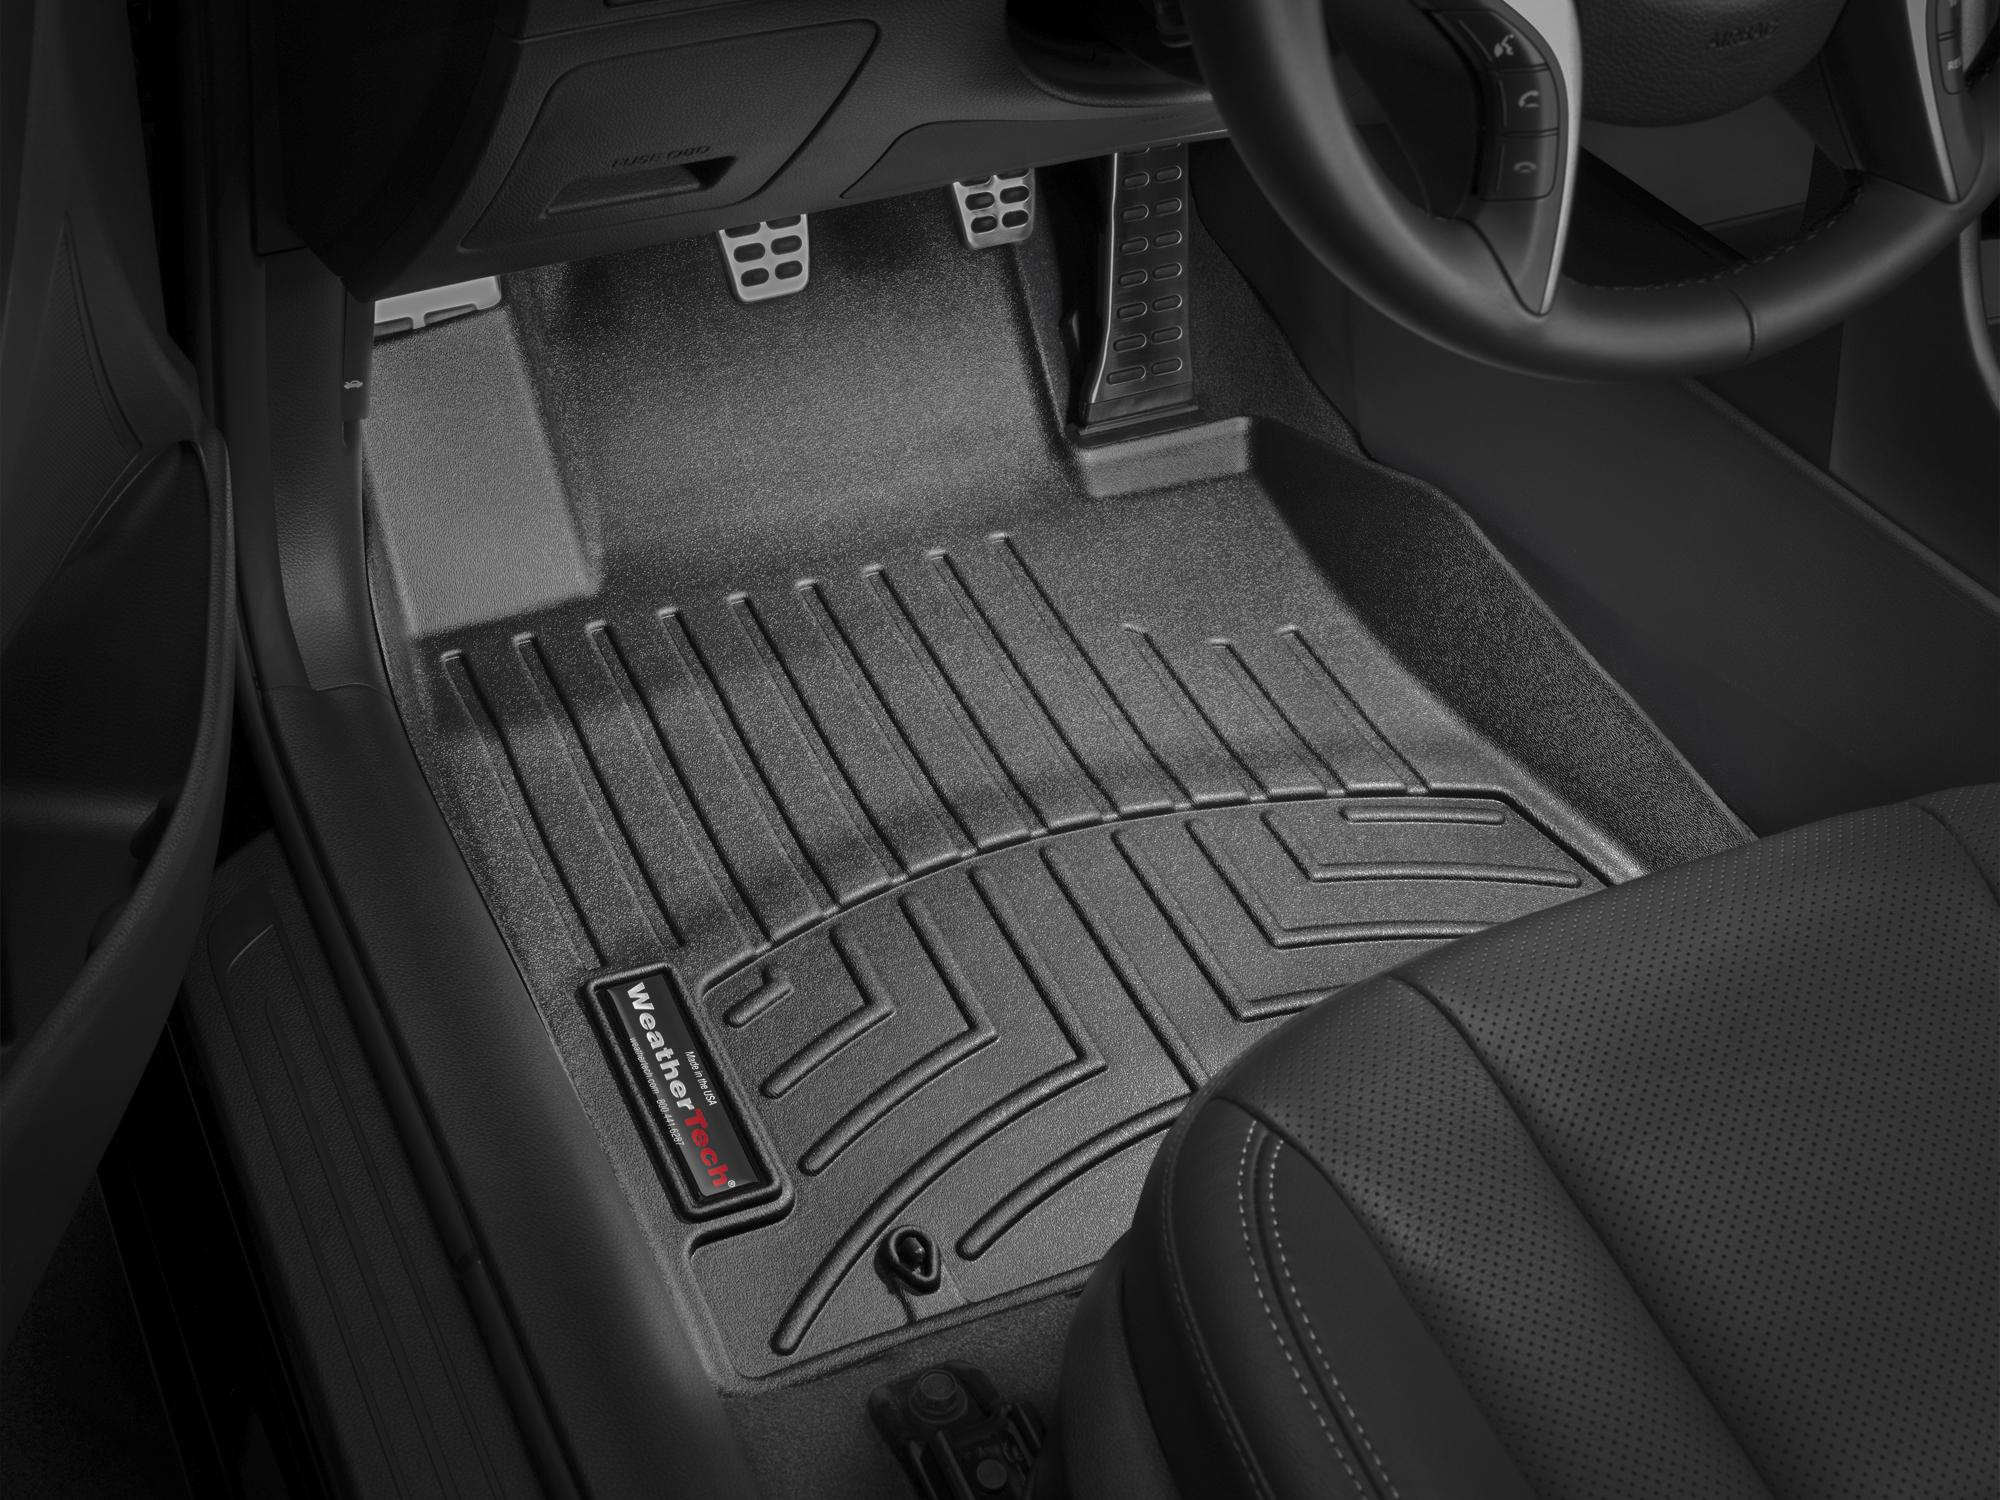 2017 Hyundai Elantra GT   AVM HD Floor Mats   Heavy Duty Flexible Trim To  Fit Mats   WeatherTech